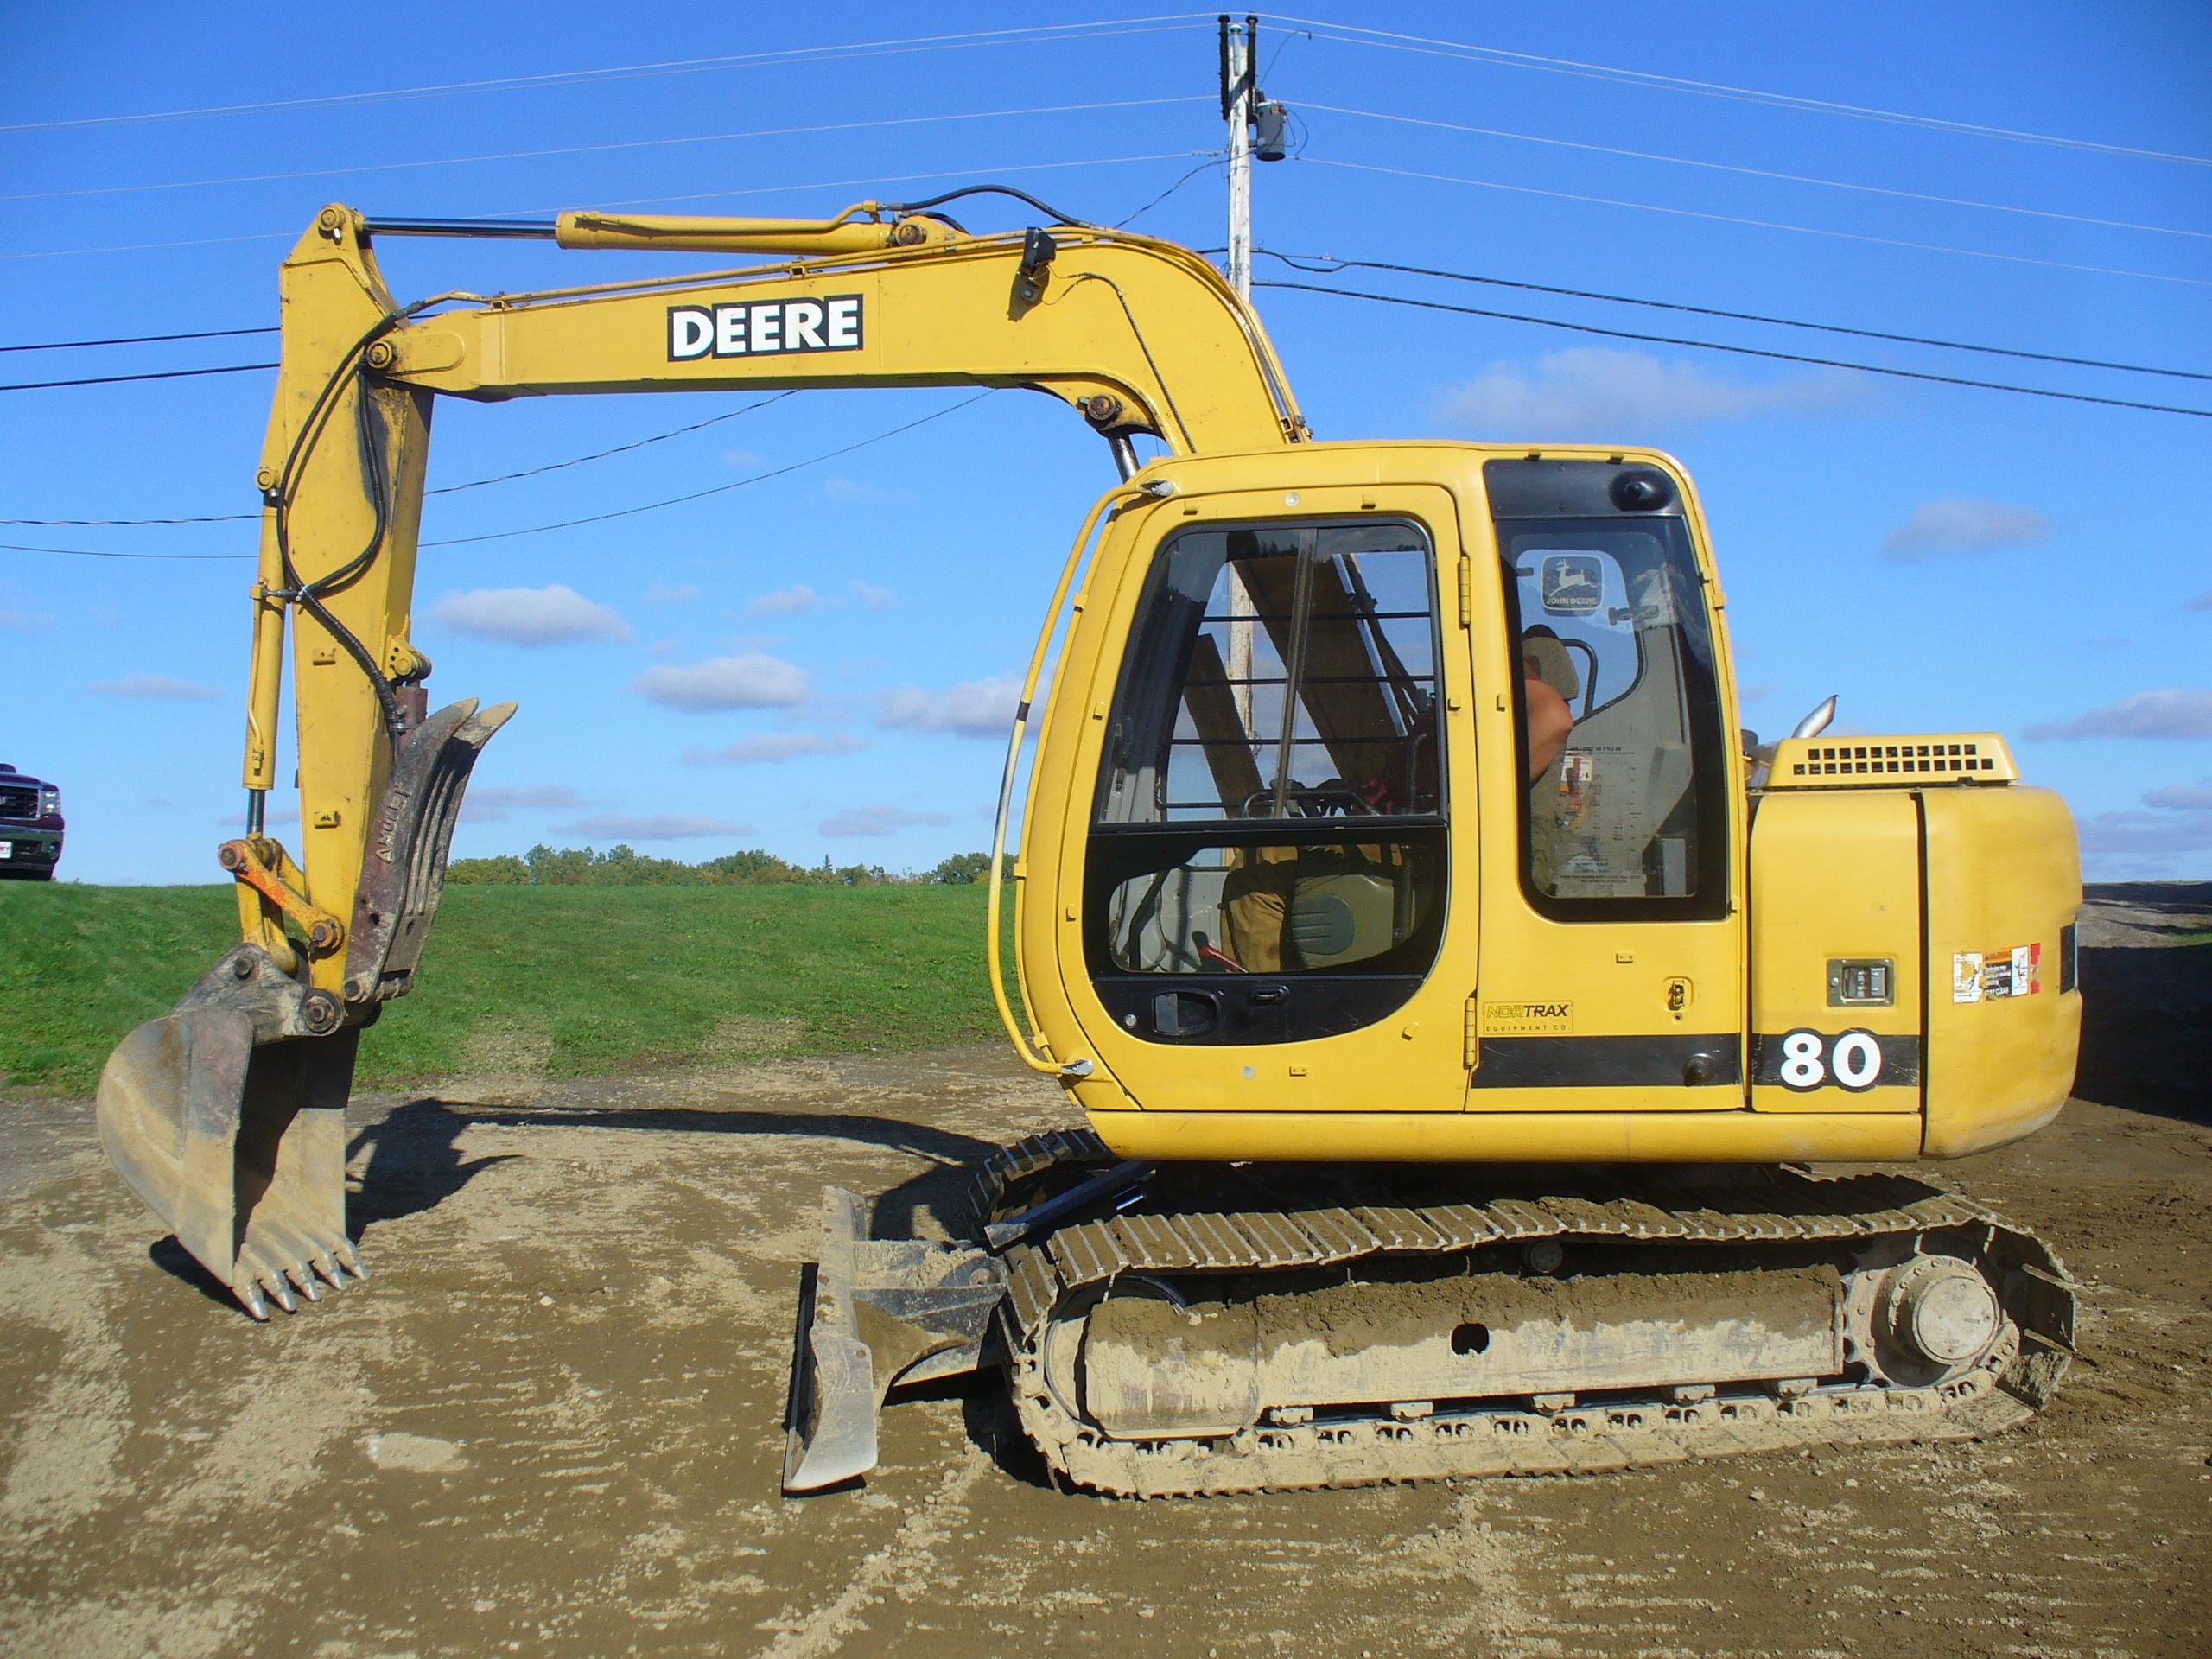 J&K Equipment (The Deere Yard)